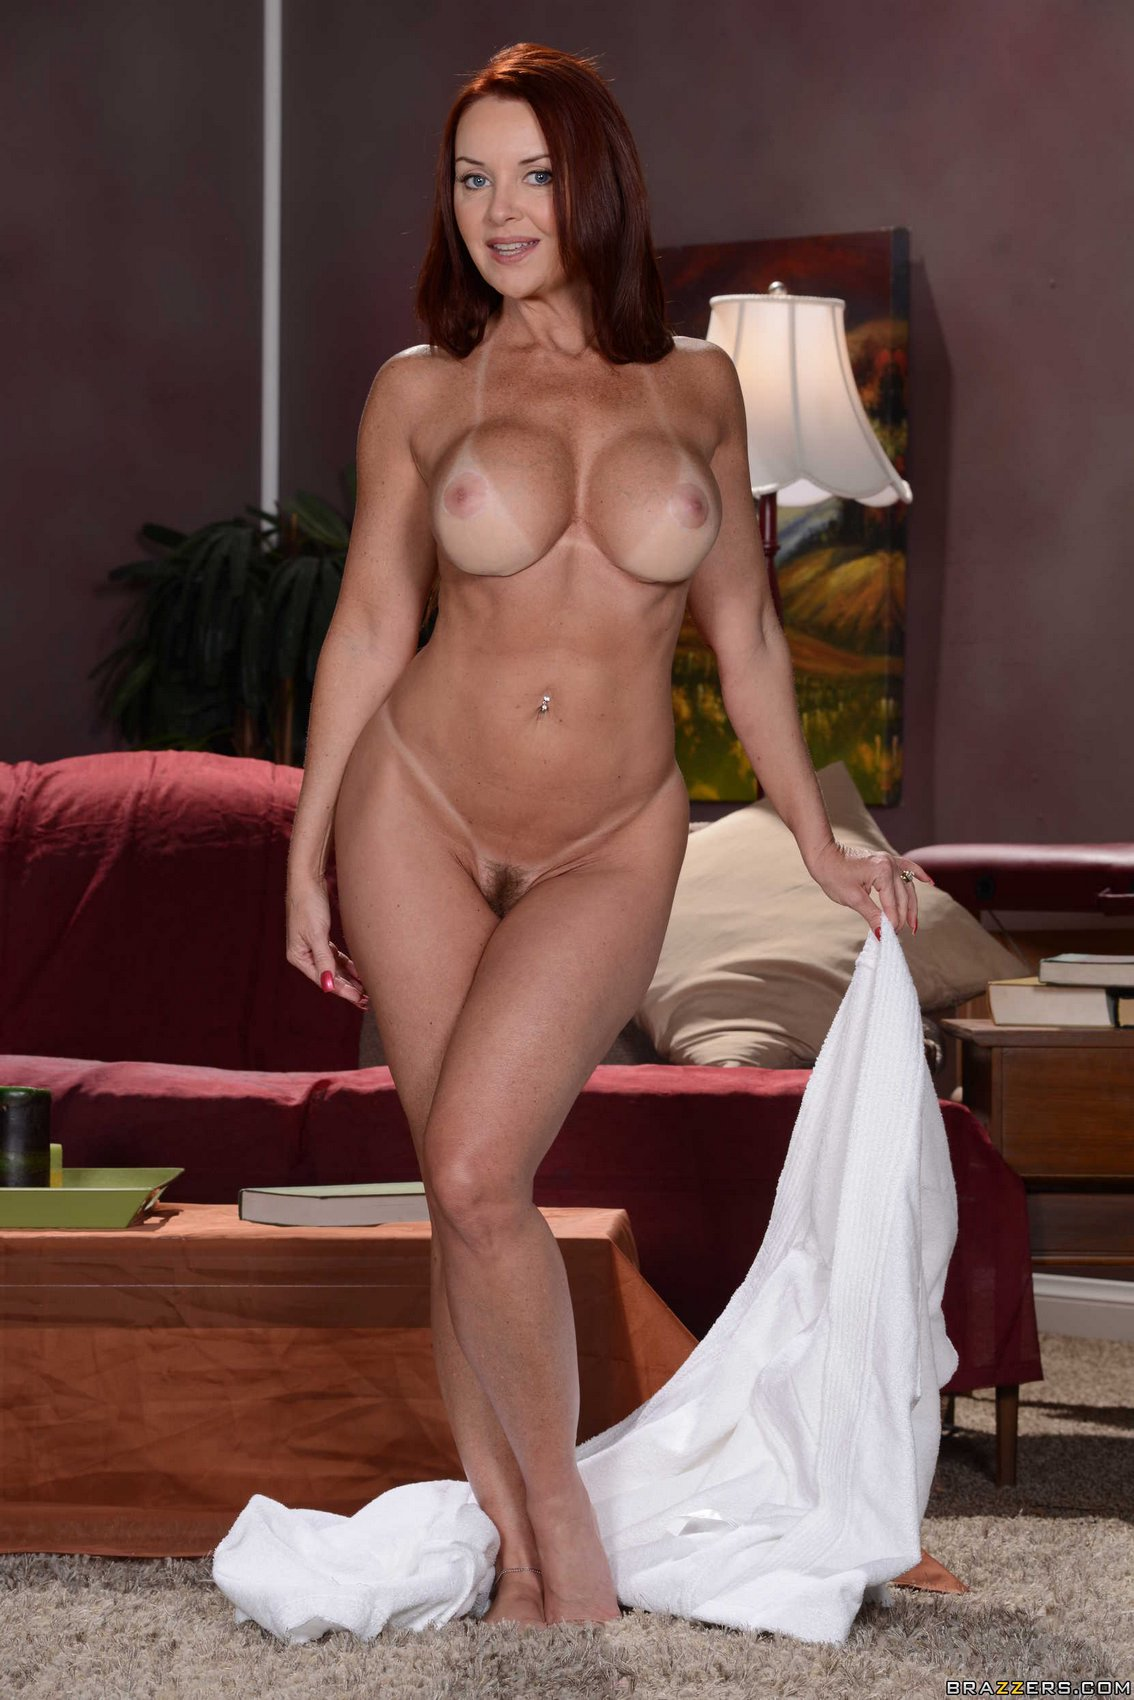 Janet mock nude